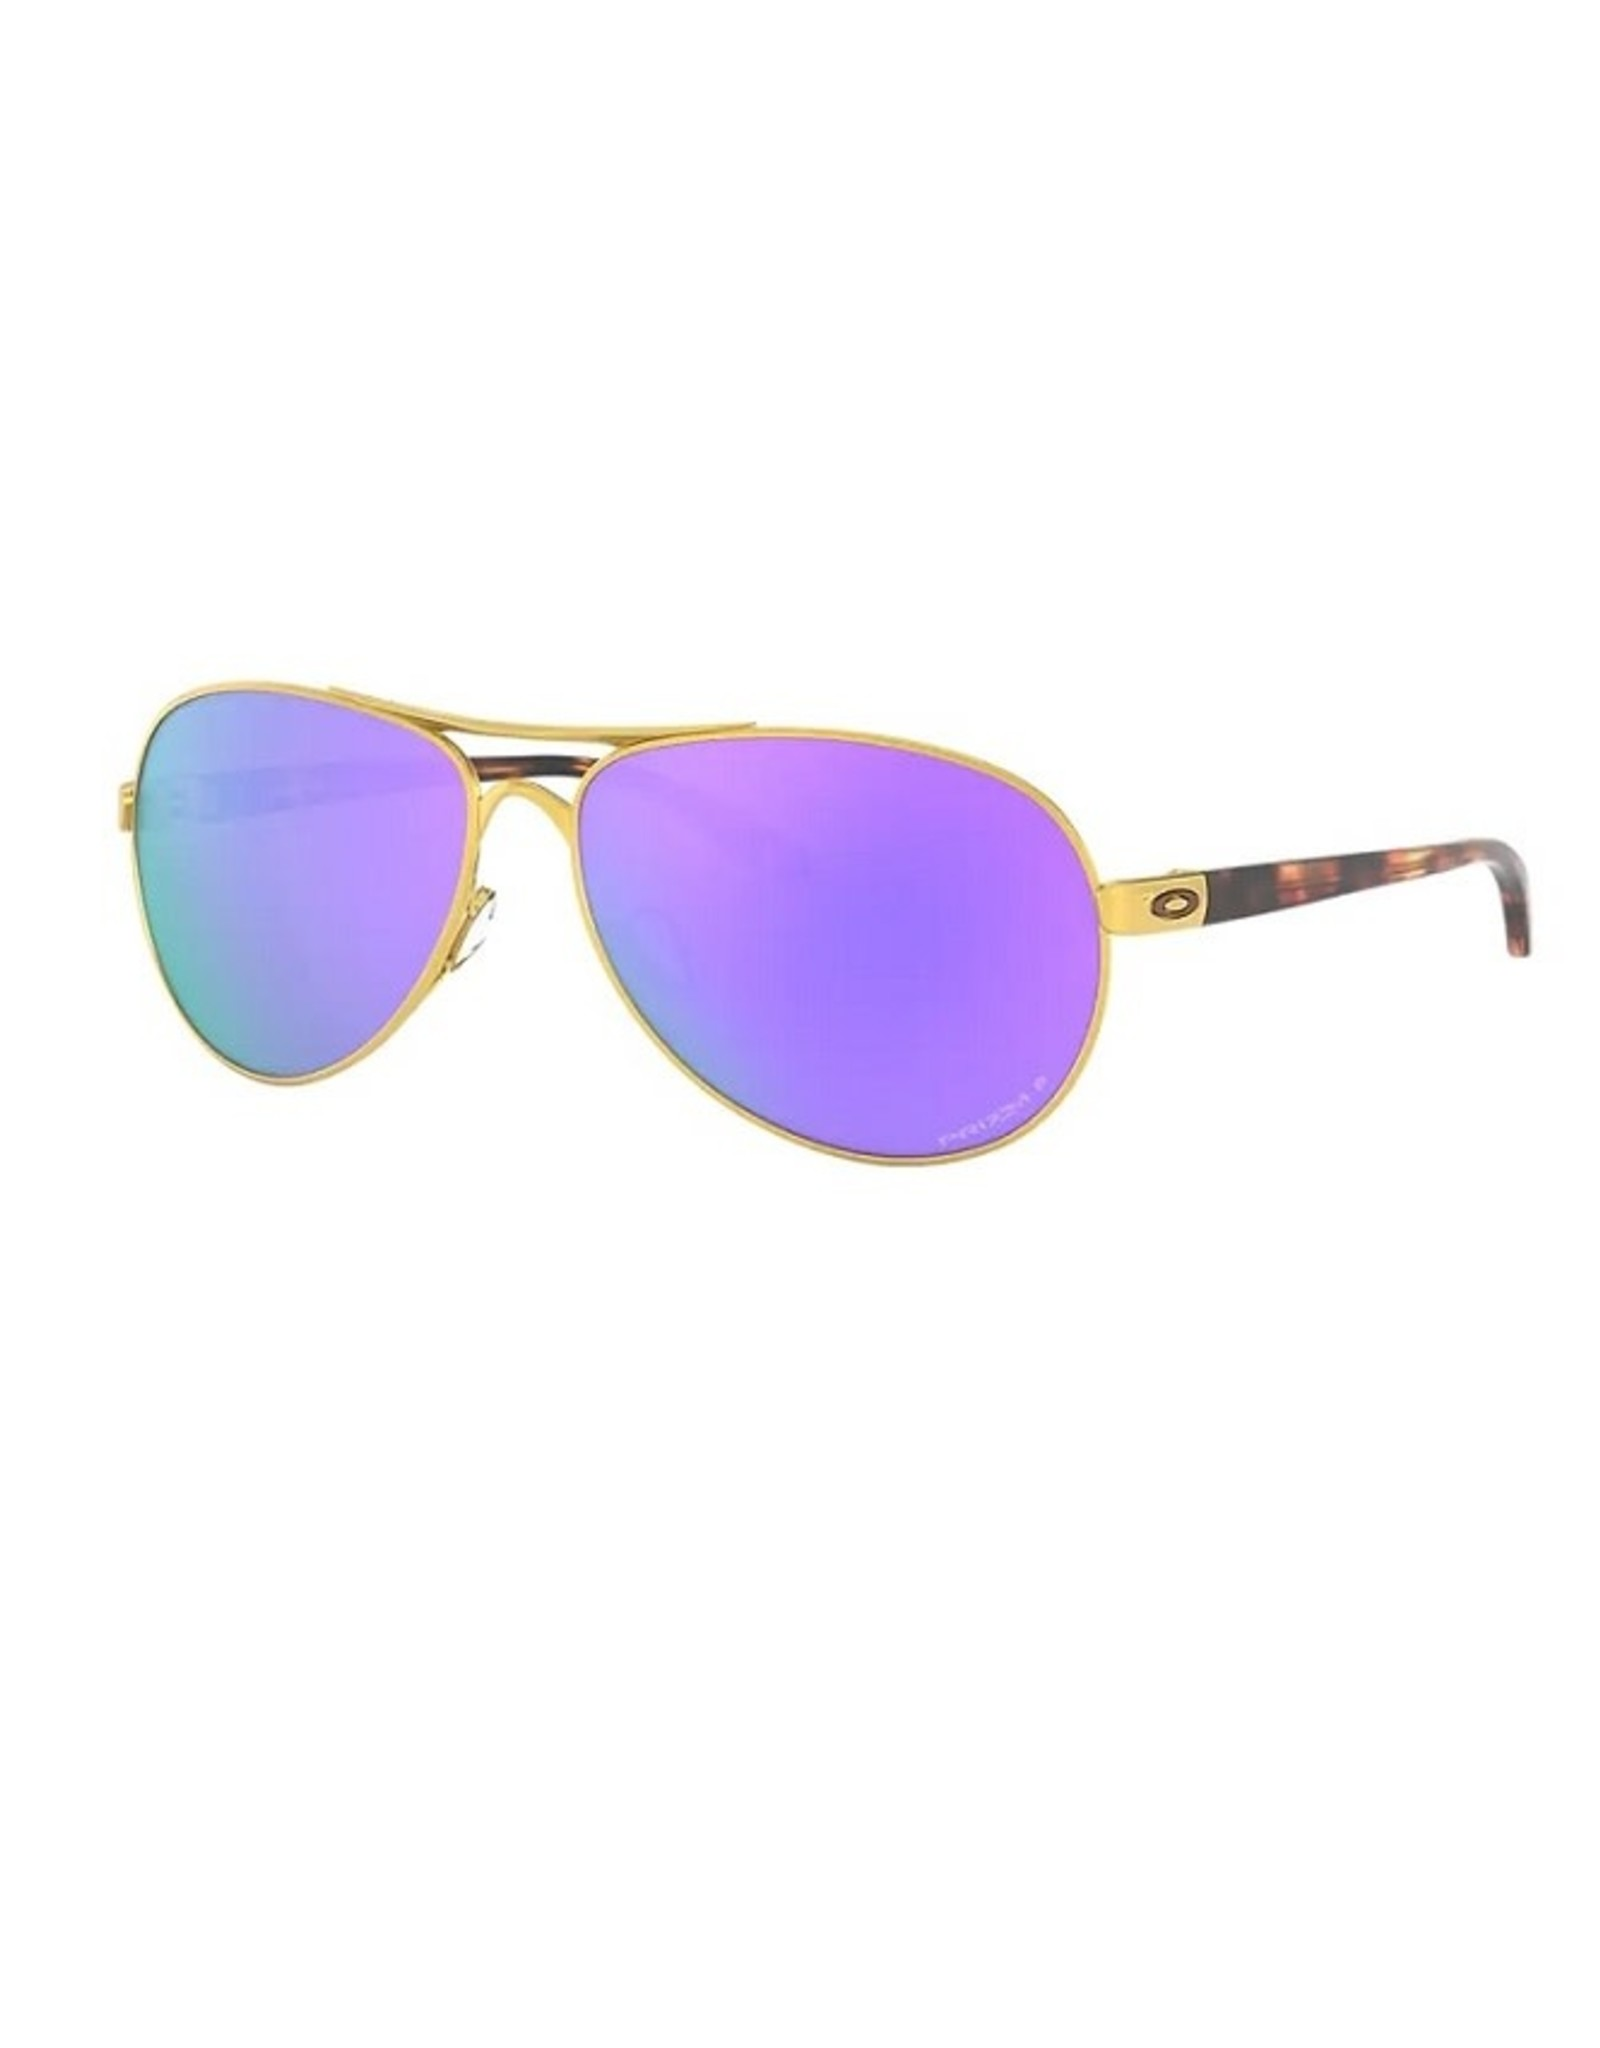 Oakley FEEDBACK Satin Gold, Prizm Violet Iridium Polarized